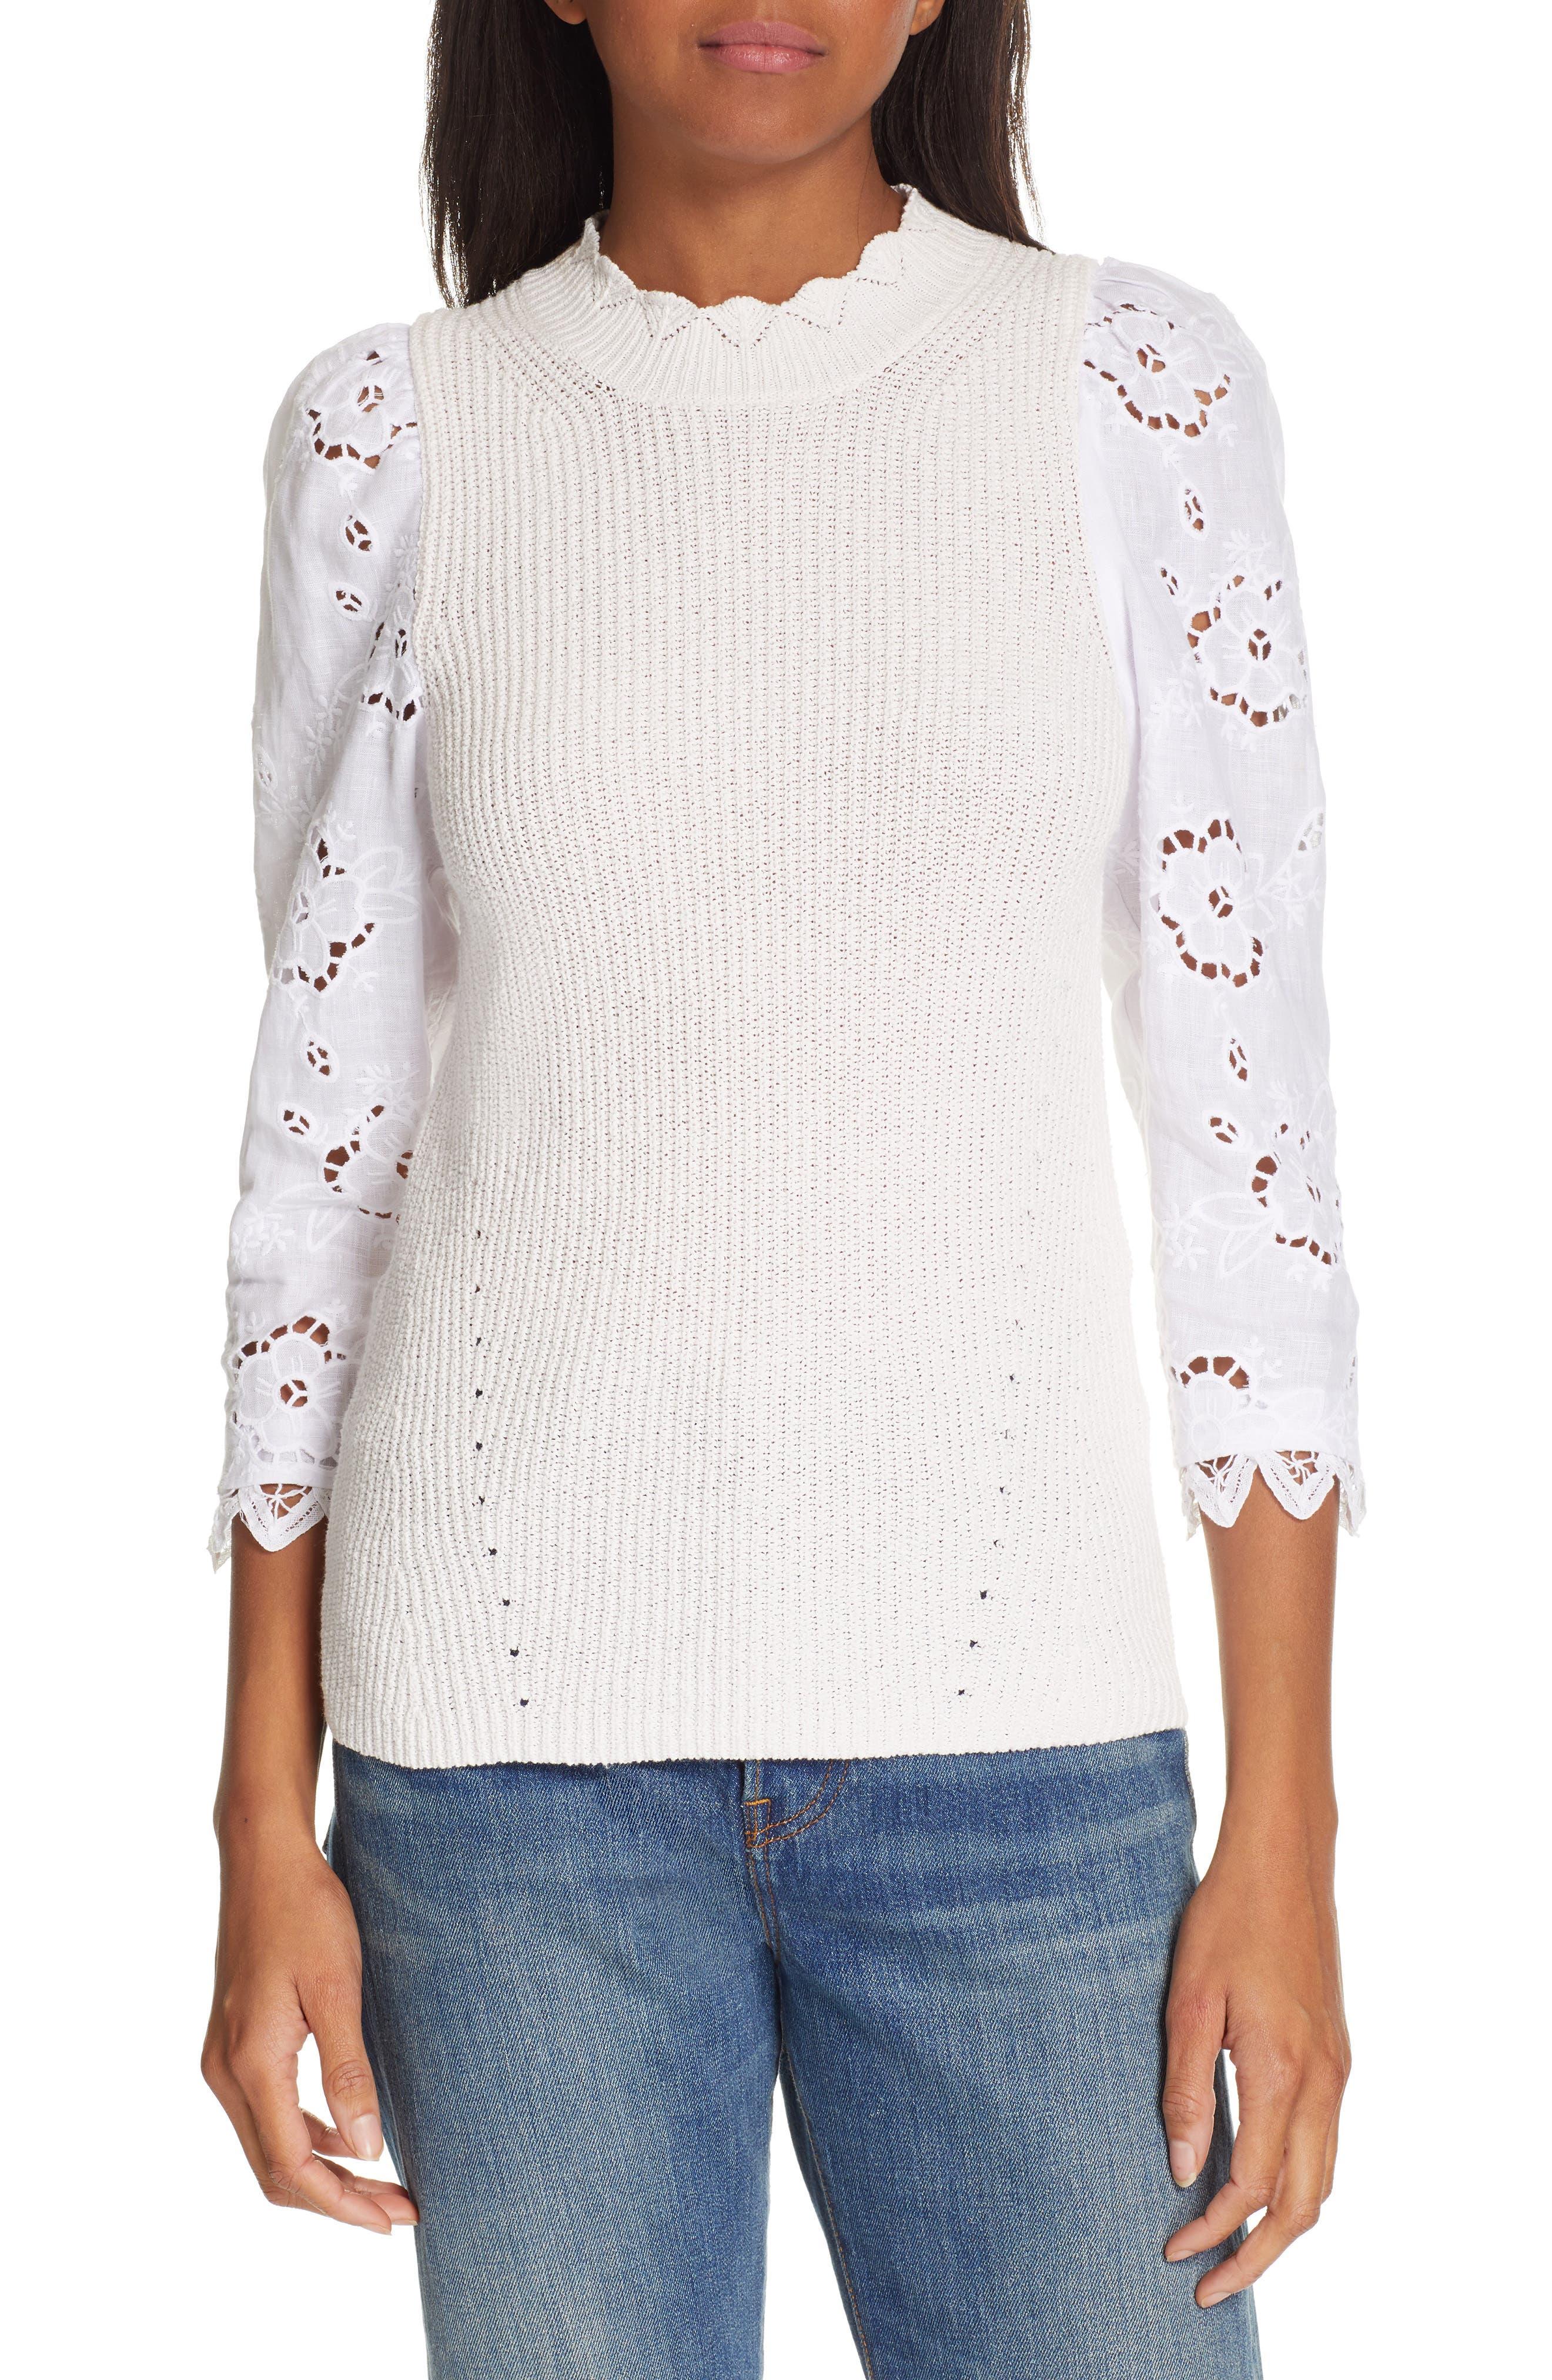 REBECCA TAYLOR, Mix Media Eyelet Sleeve Cotton Sweater, Main thumbnail 1, color, WASHED PETAL